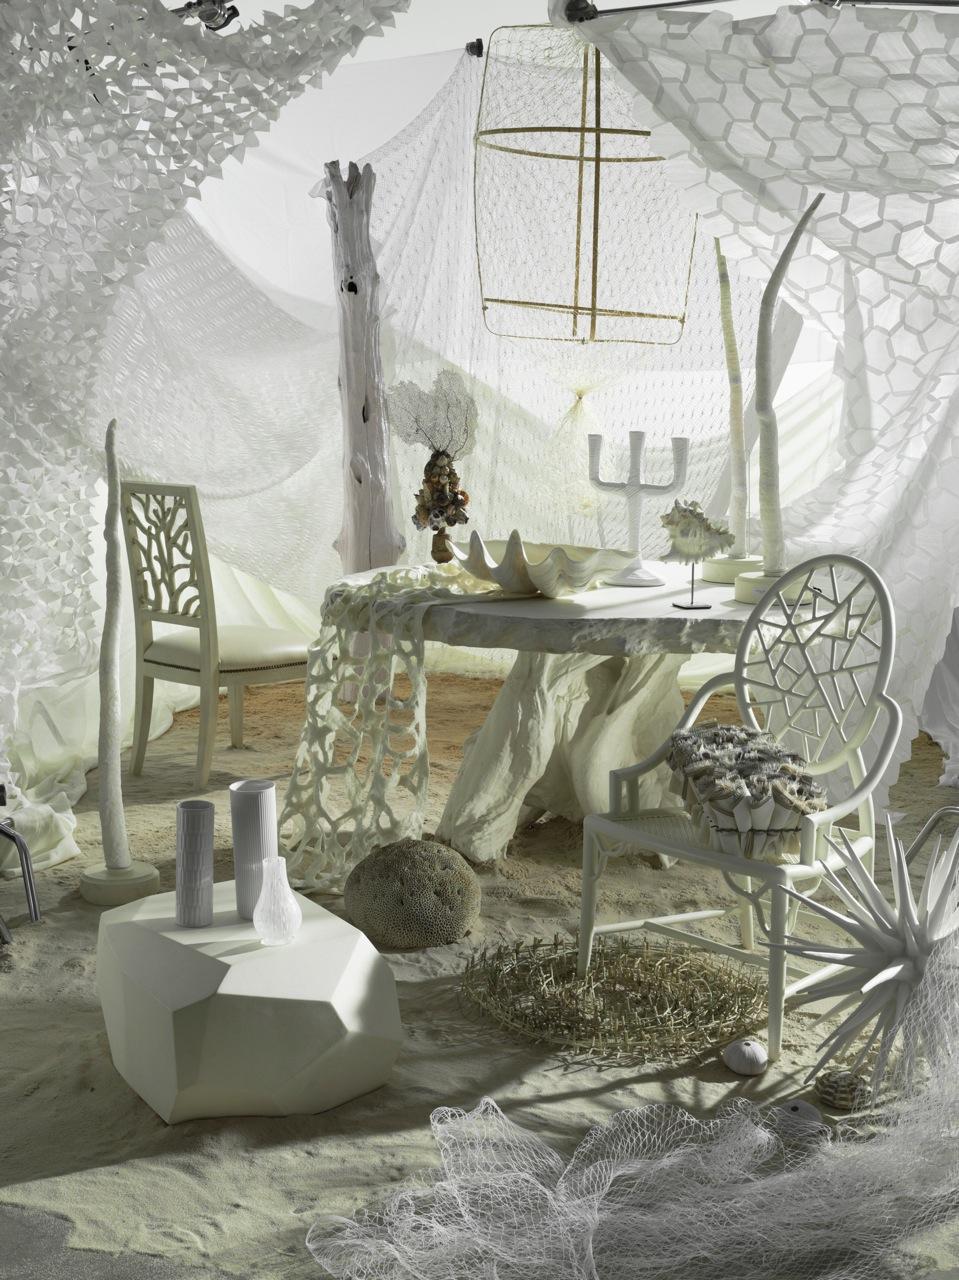 daily imprint interviews on creative living stylist steve cordony